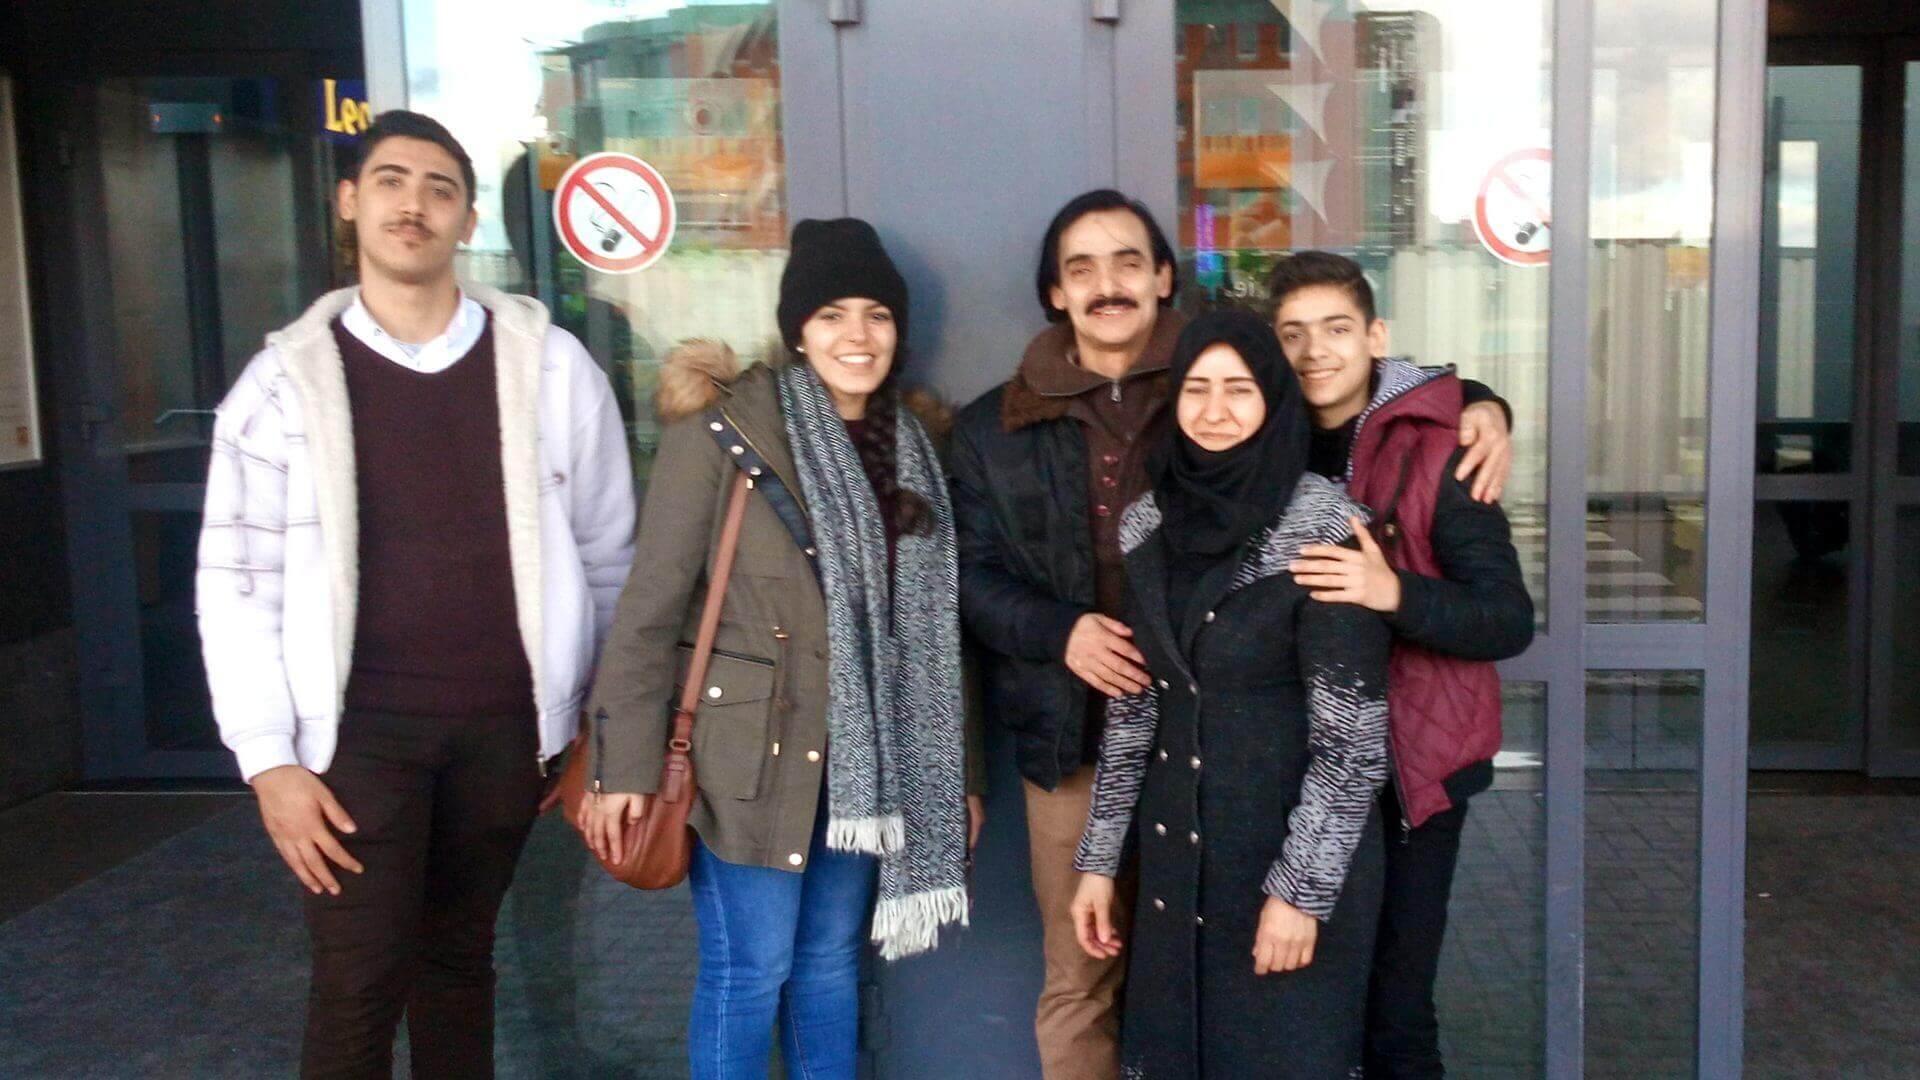 Caritas International Belgium Marwane's Story